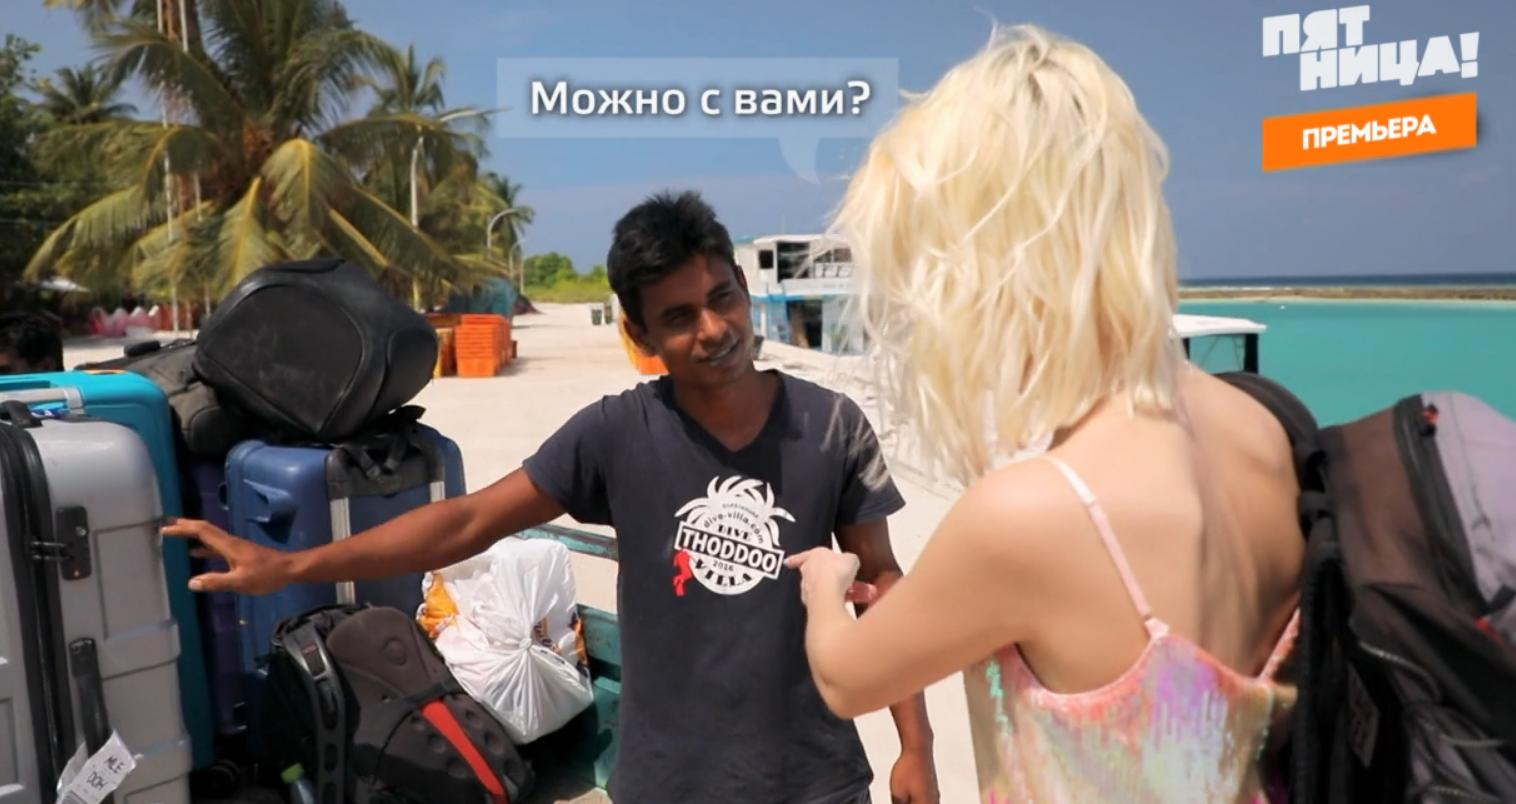 Maldives orel i reshka thoddoo dive villa guest house КОМАНДА ОРЕл И РЕШКА - ВЕДУЩАЯ КЛАВА КОКА